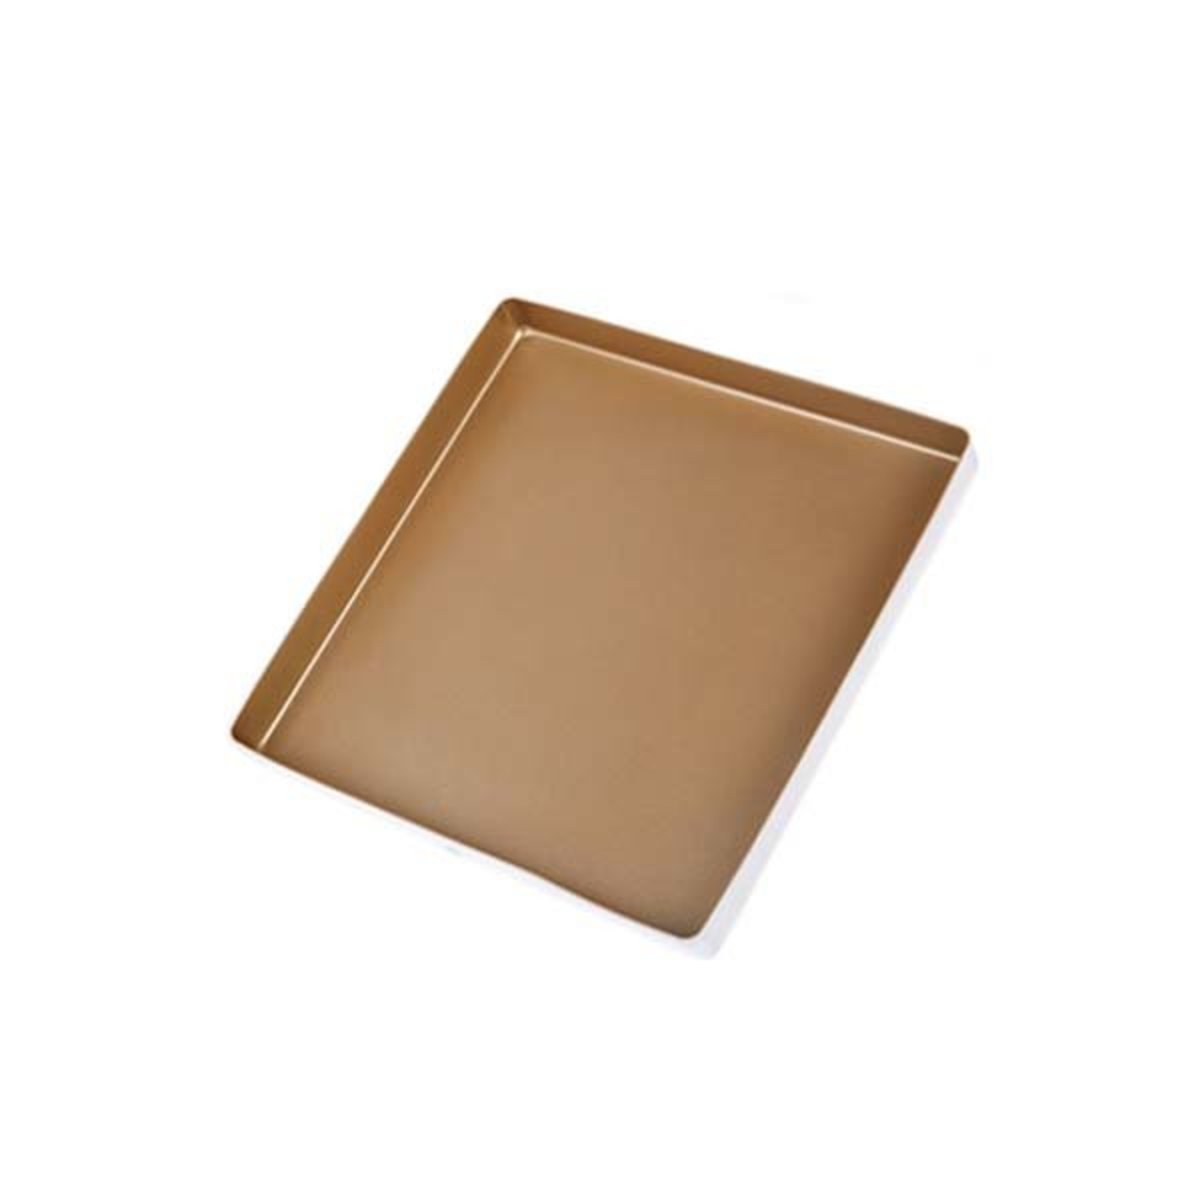 Unopan - 正方形焗盤 (鋁合金)